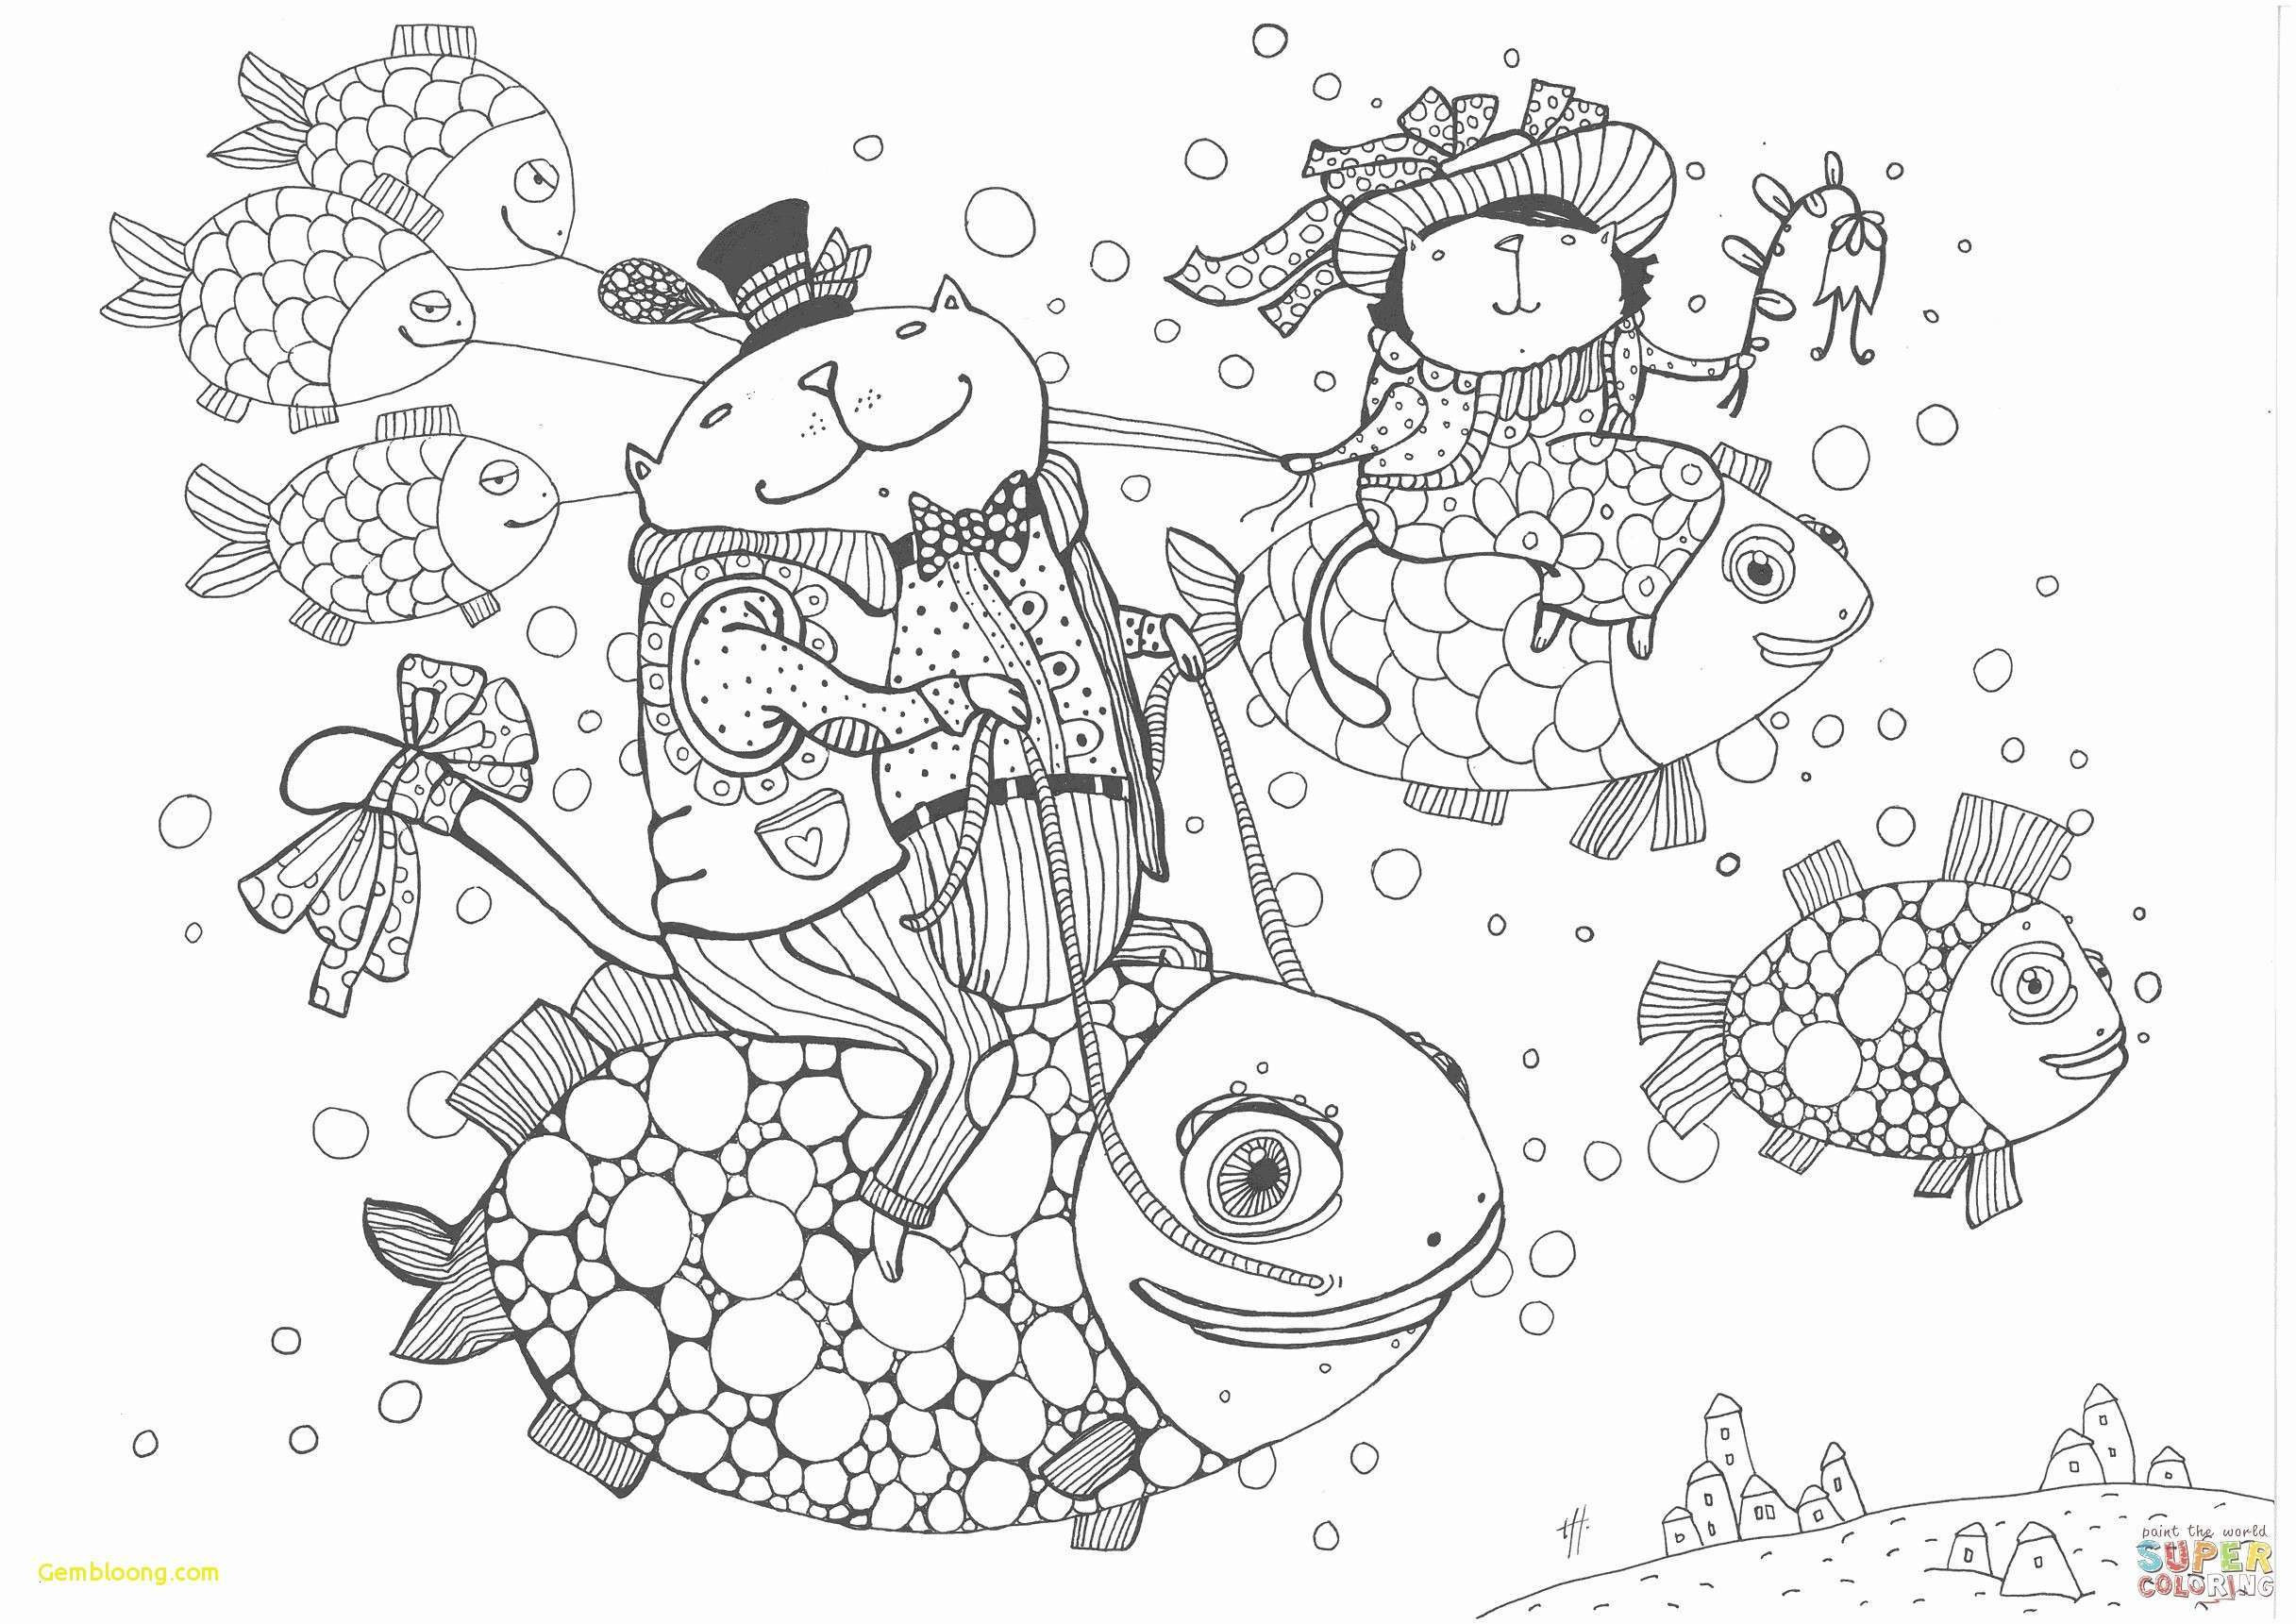 Anime Ausmalbilder Chibi Neu Elsa Christmas Coloring Pages Printable Malvorlagen Schön Das Bild